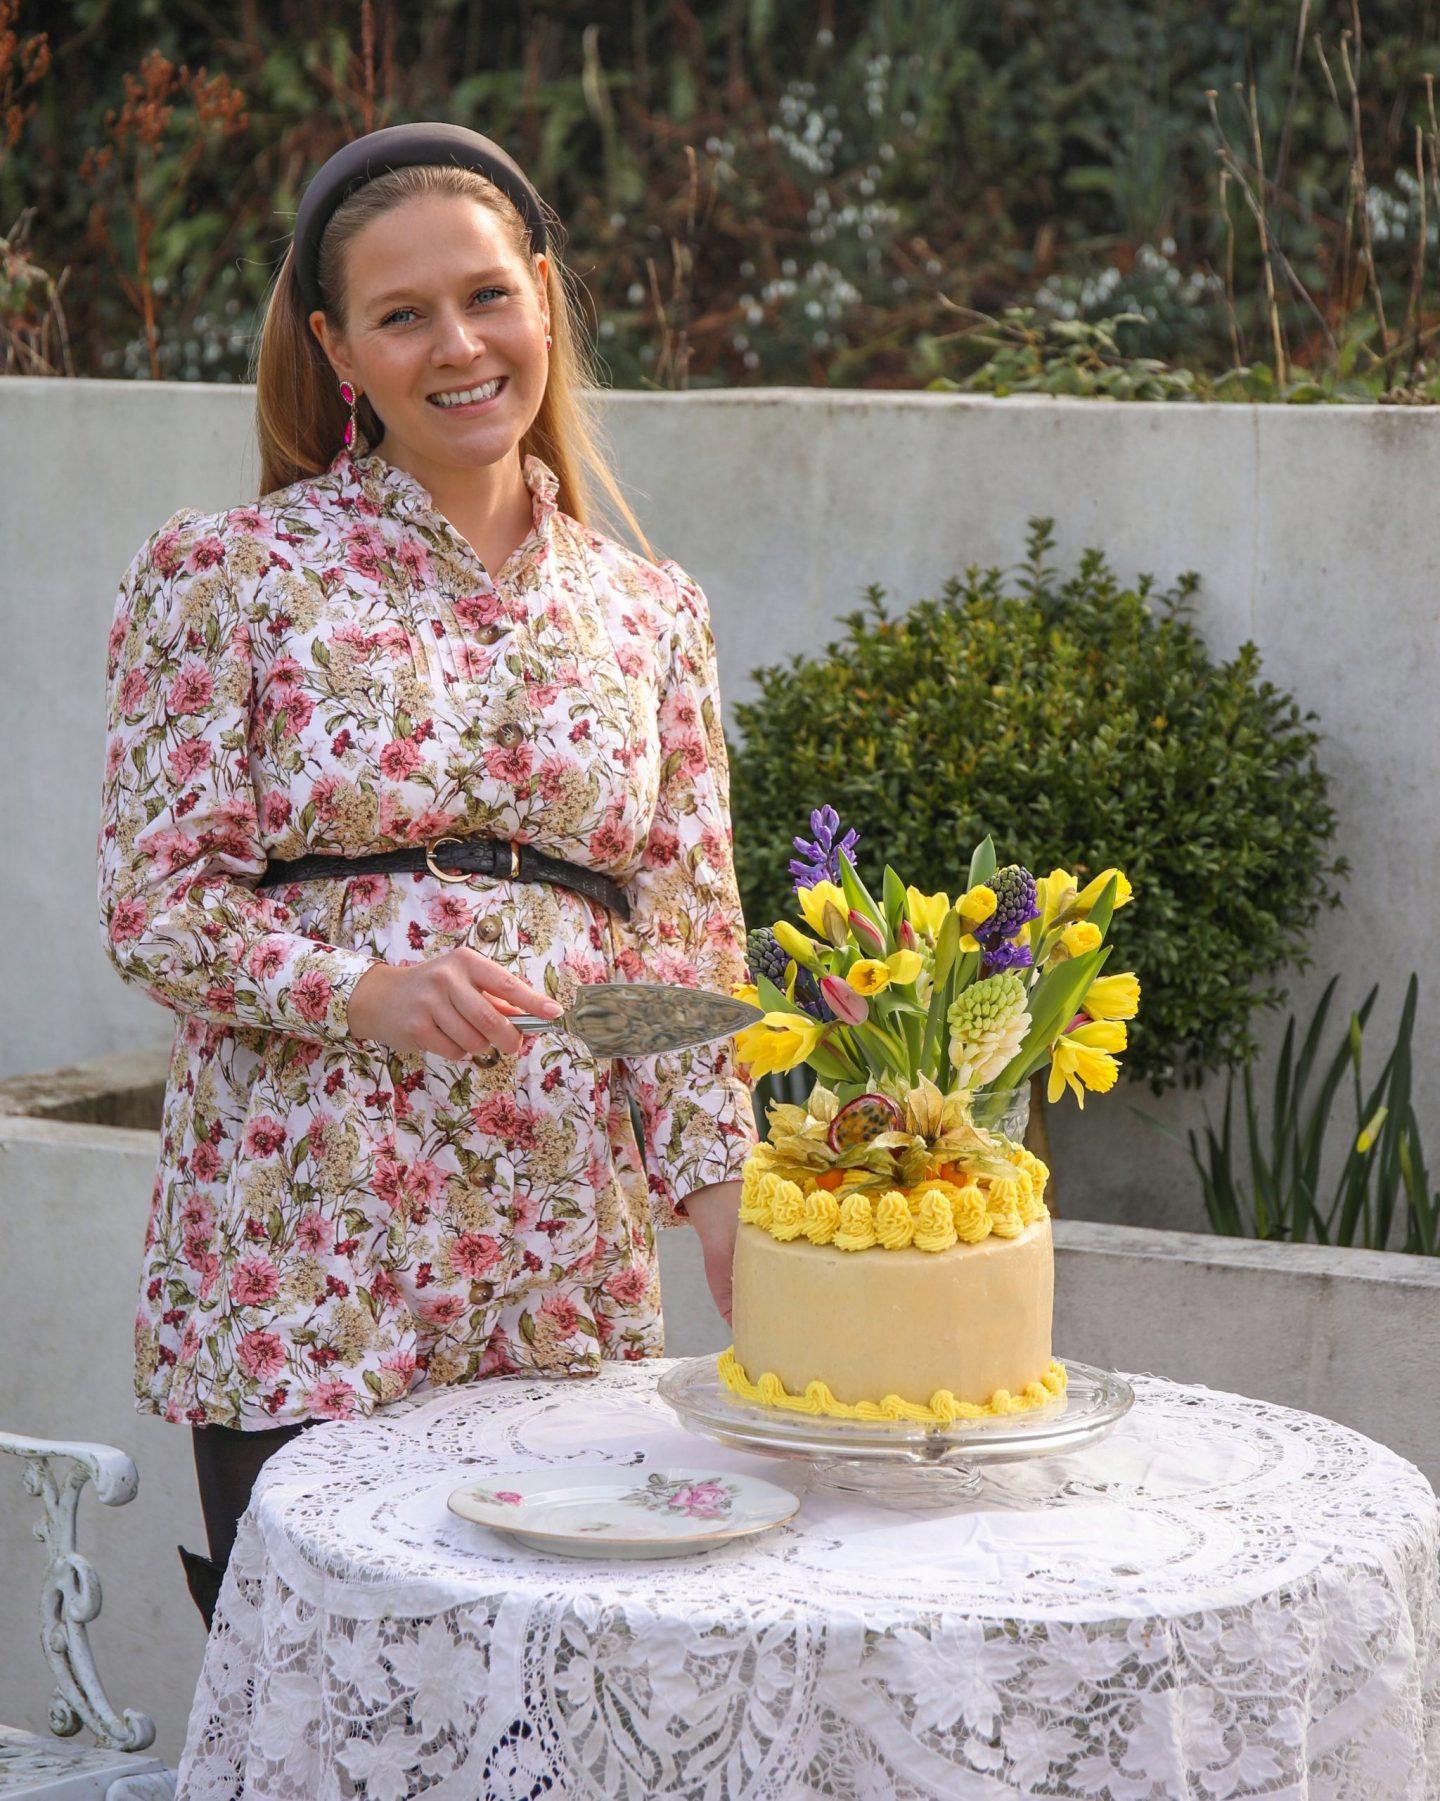 Chocolate and Passion Fruit Four Tier Celebration Cake, Katie Heath KALANCHOE